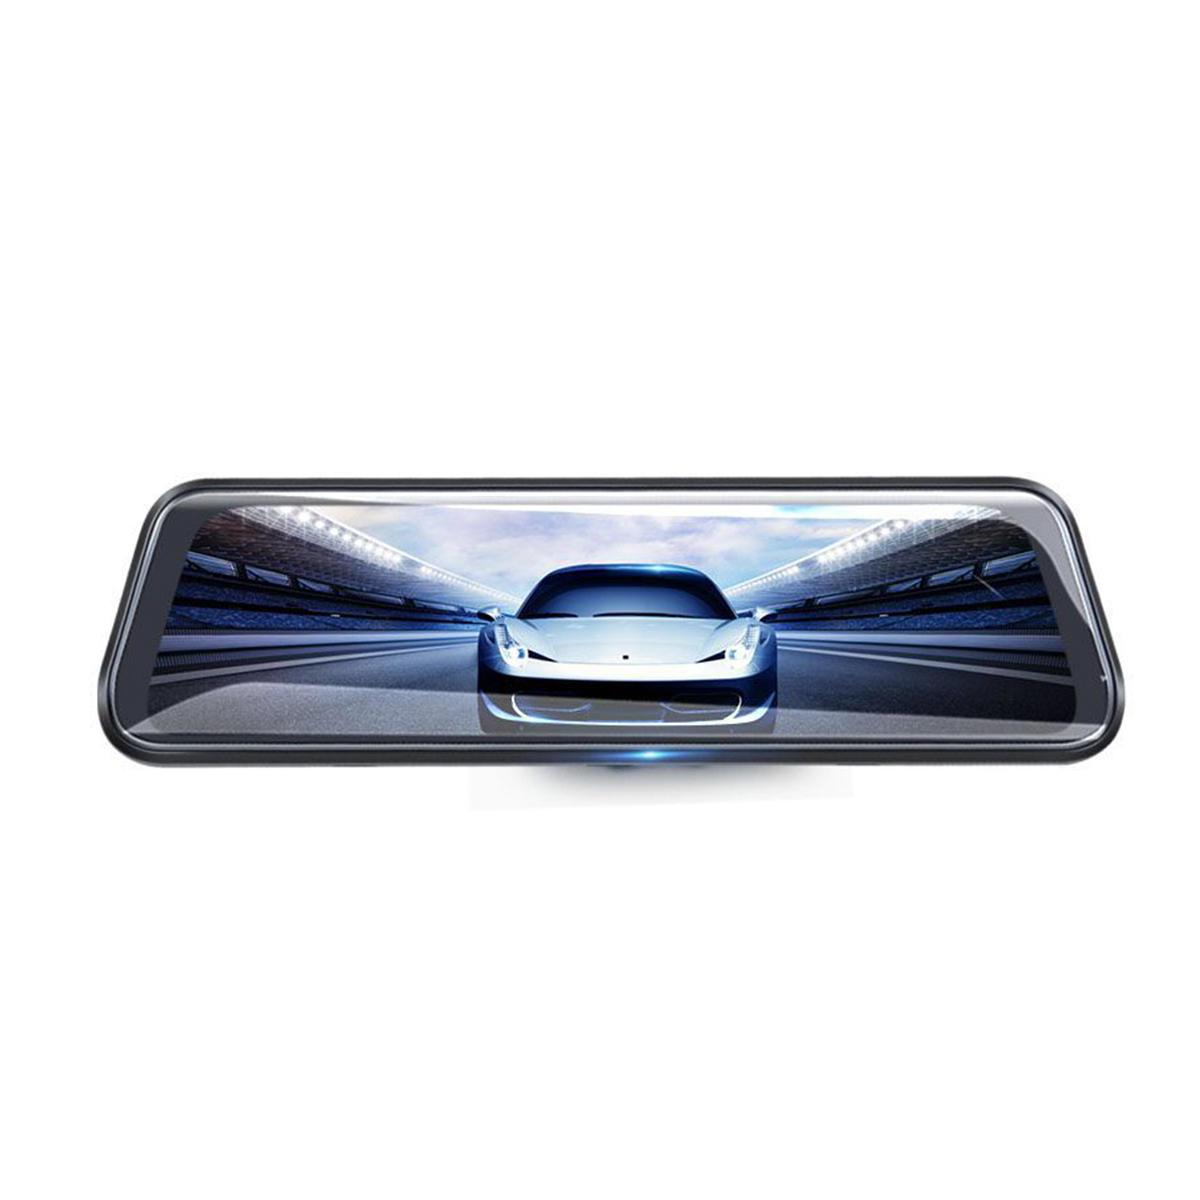 10 Inch Junsun Dual Lens FHD 1080P Dash Cam Car DVR Rearview Mirror Backup Camera